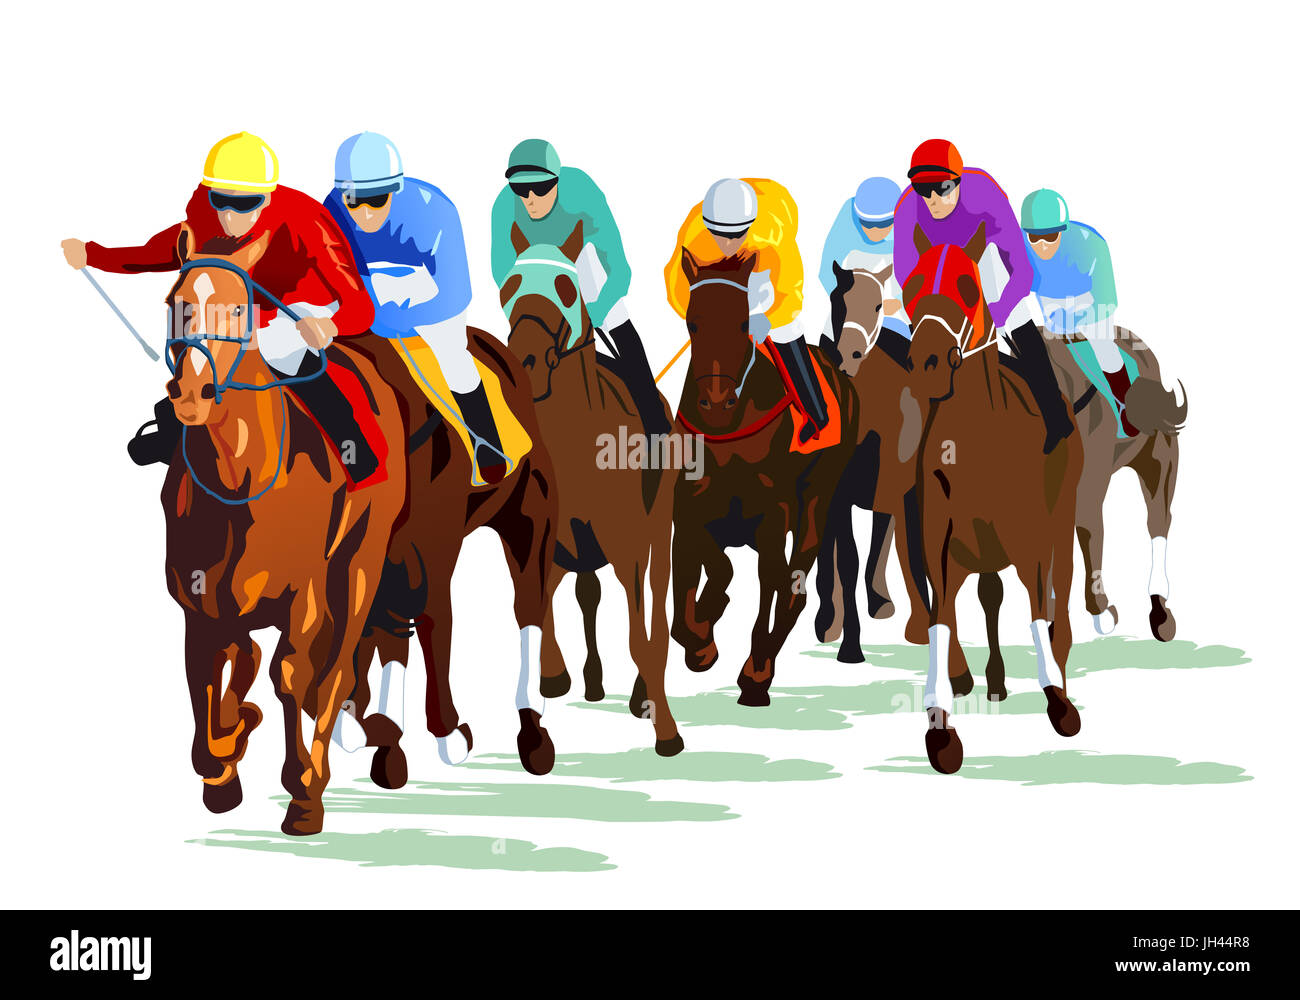 Racehorses with jockeys on the race track - Stock Image